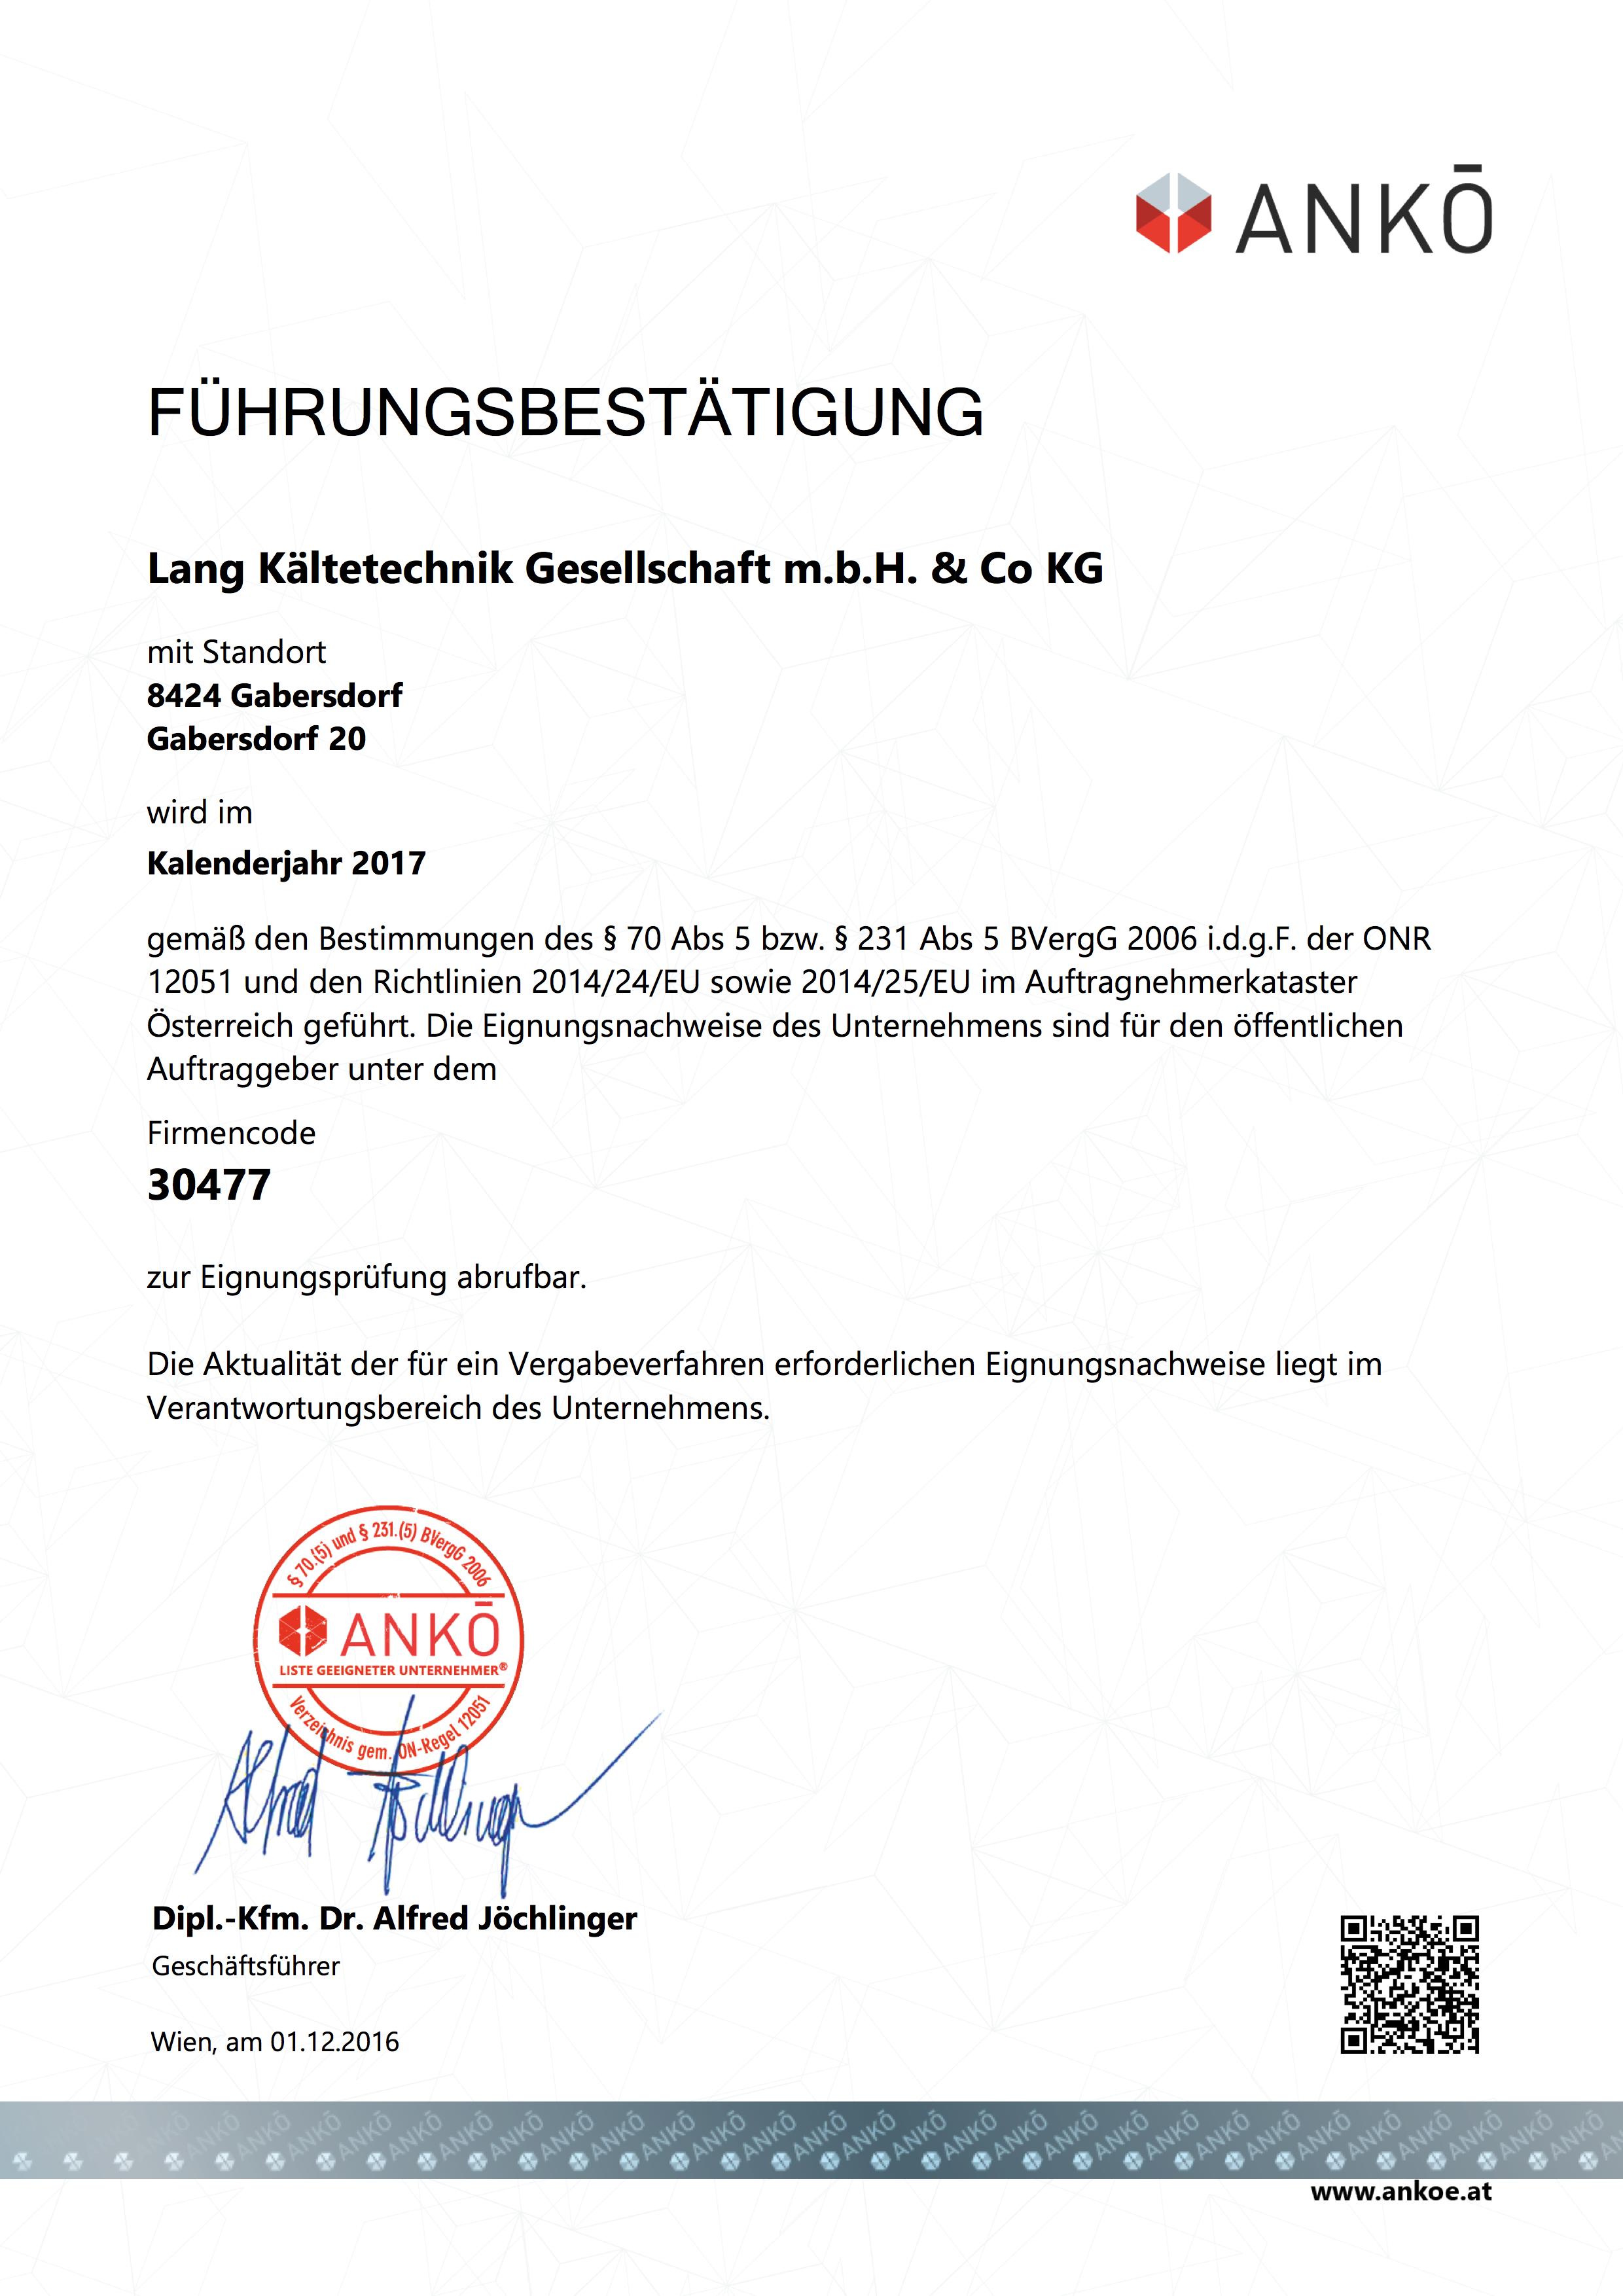 Fuehrungszertifikat_2017